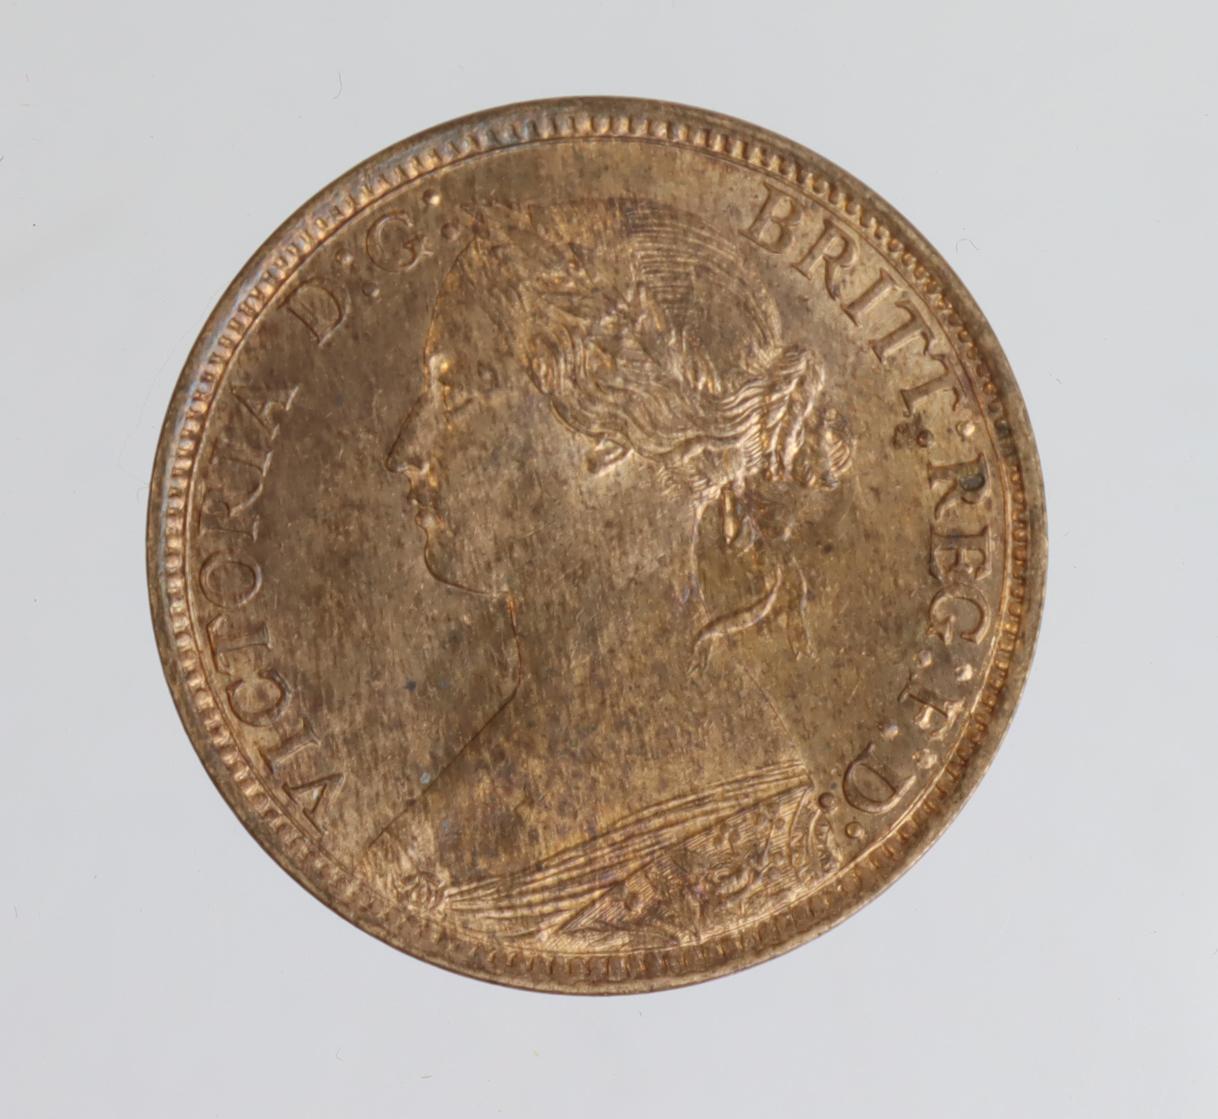 Farthing 1873 near BU, patchy tone rev.